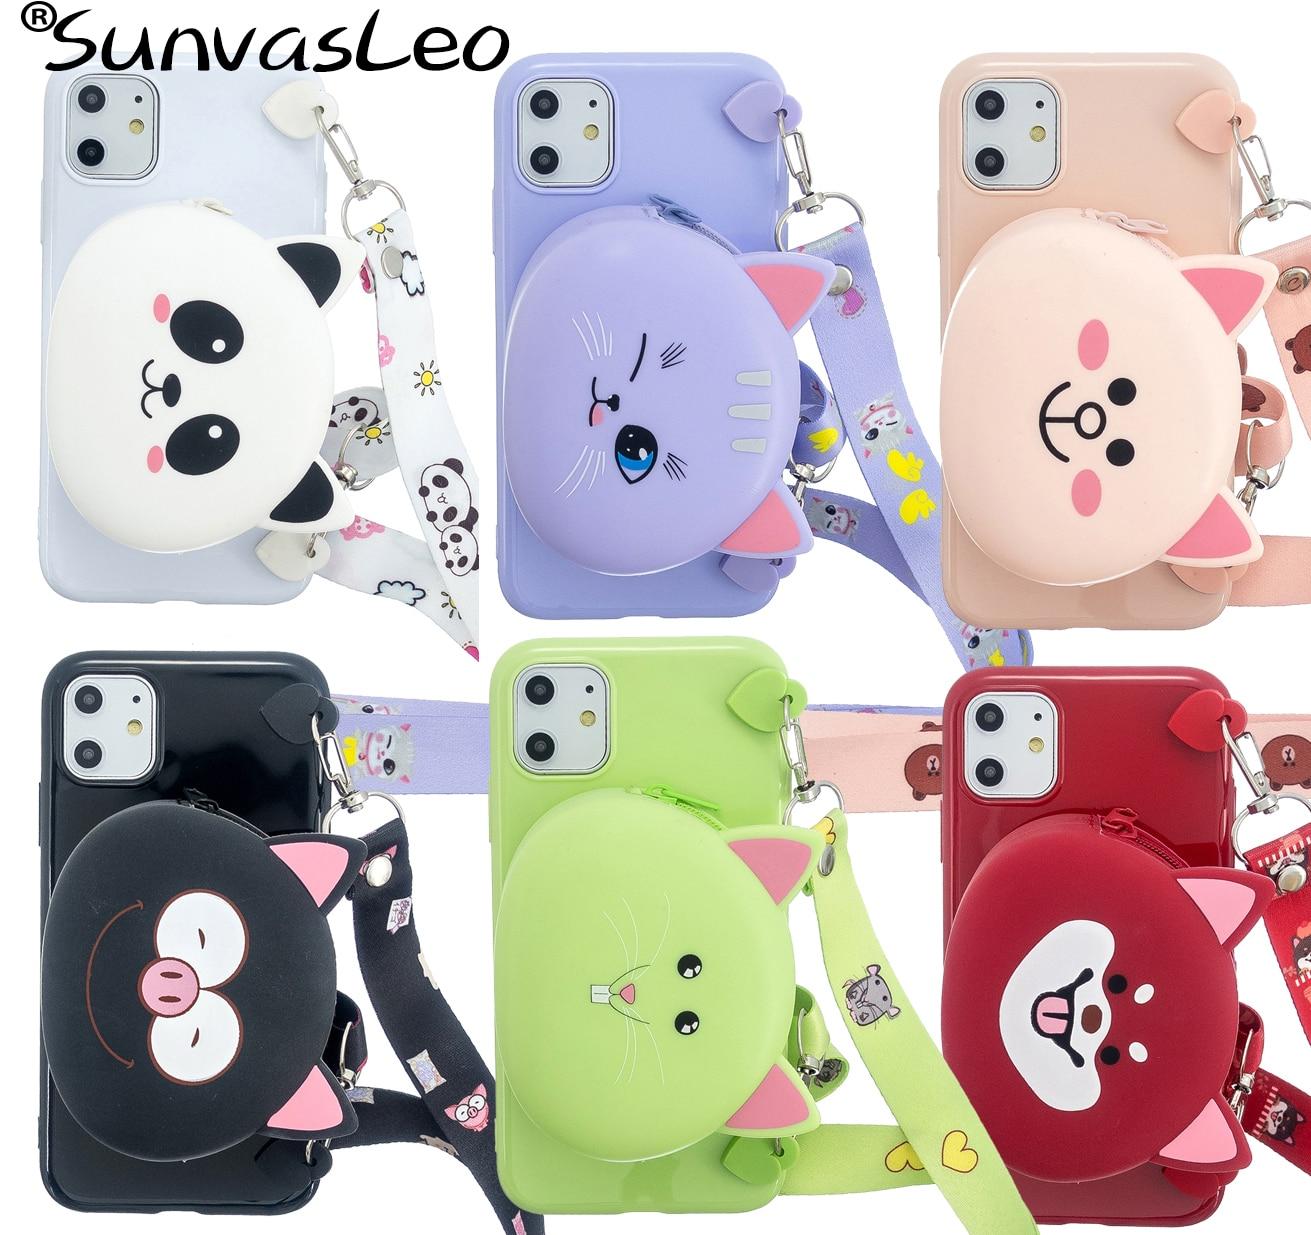 For iPhone 5 5s SE 6 6s 7 8 Plus X XS XR XS Max 11 11 Pro Max 3D Cartoon Animal Soft Silicone Purse Case Wallet Cover Strap Bag